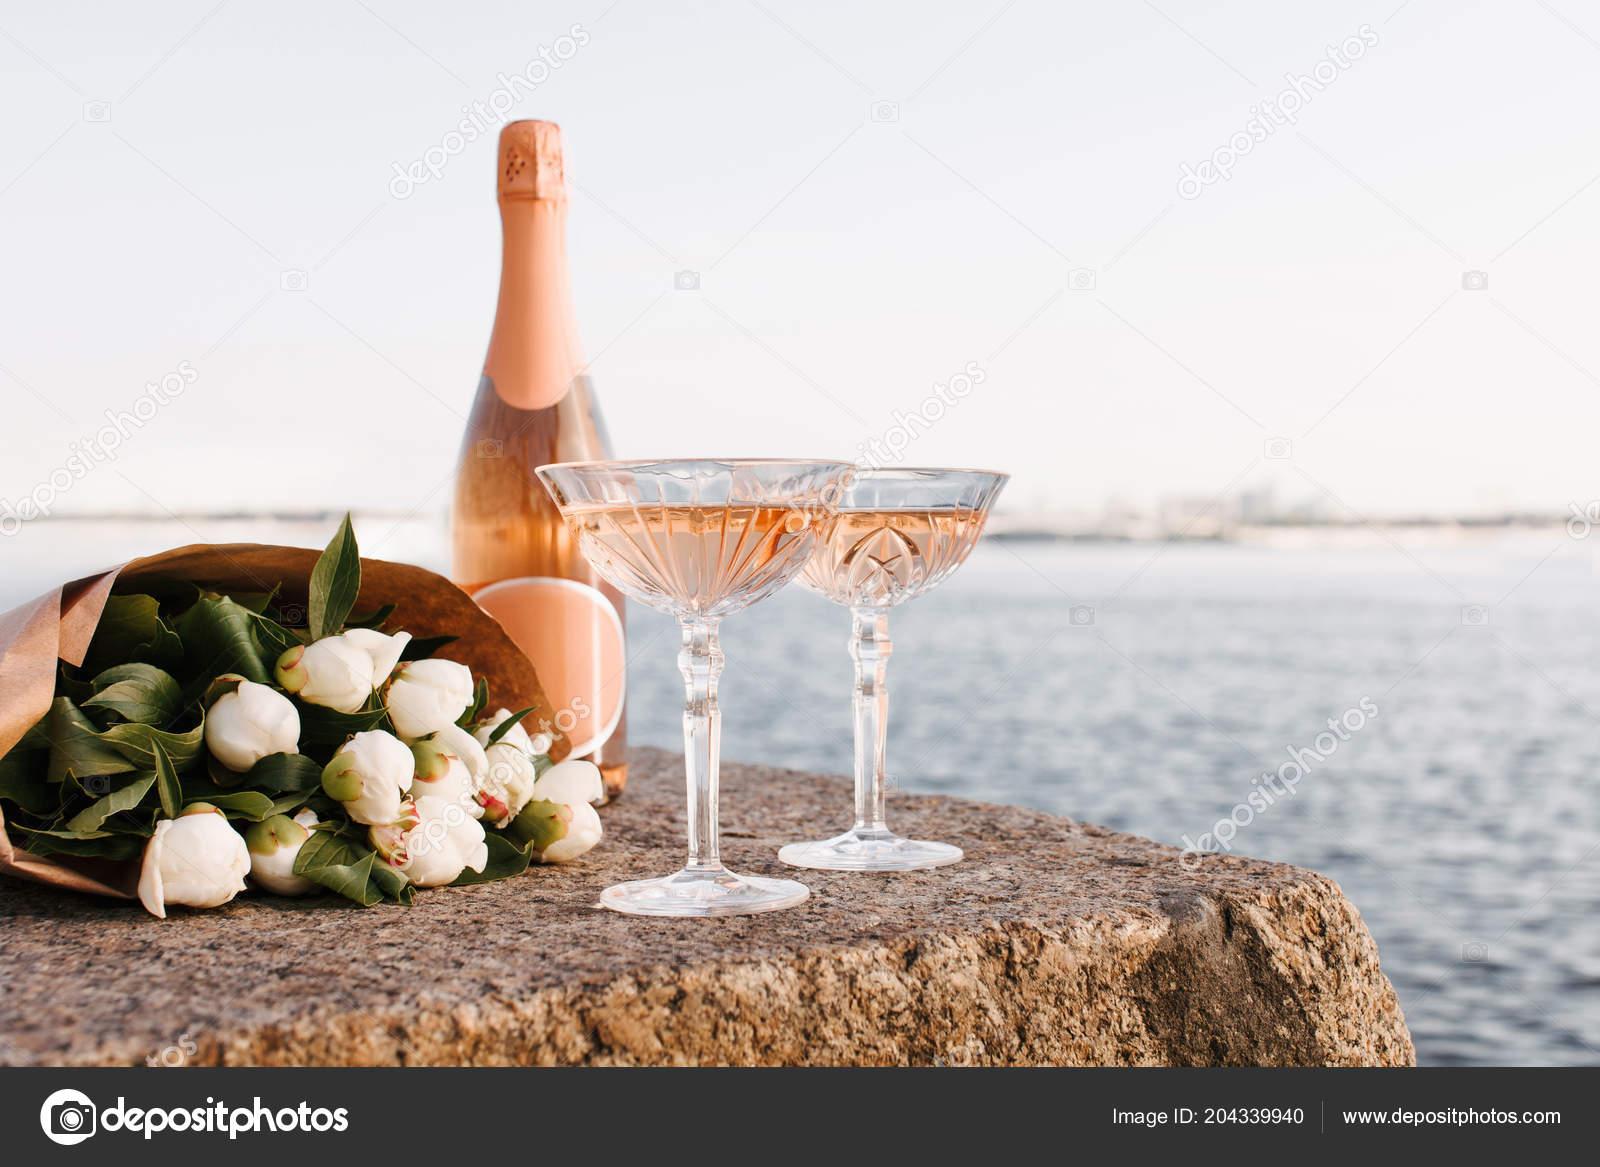 Просмотр видео разъеб очка бутылкой шампанского, порно фото униформа галереи